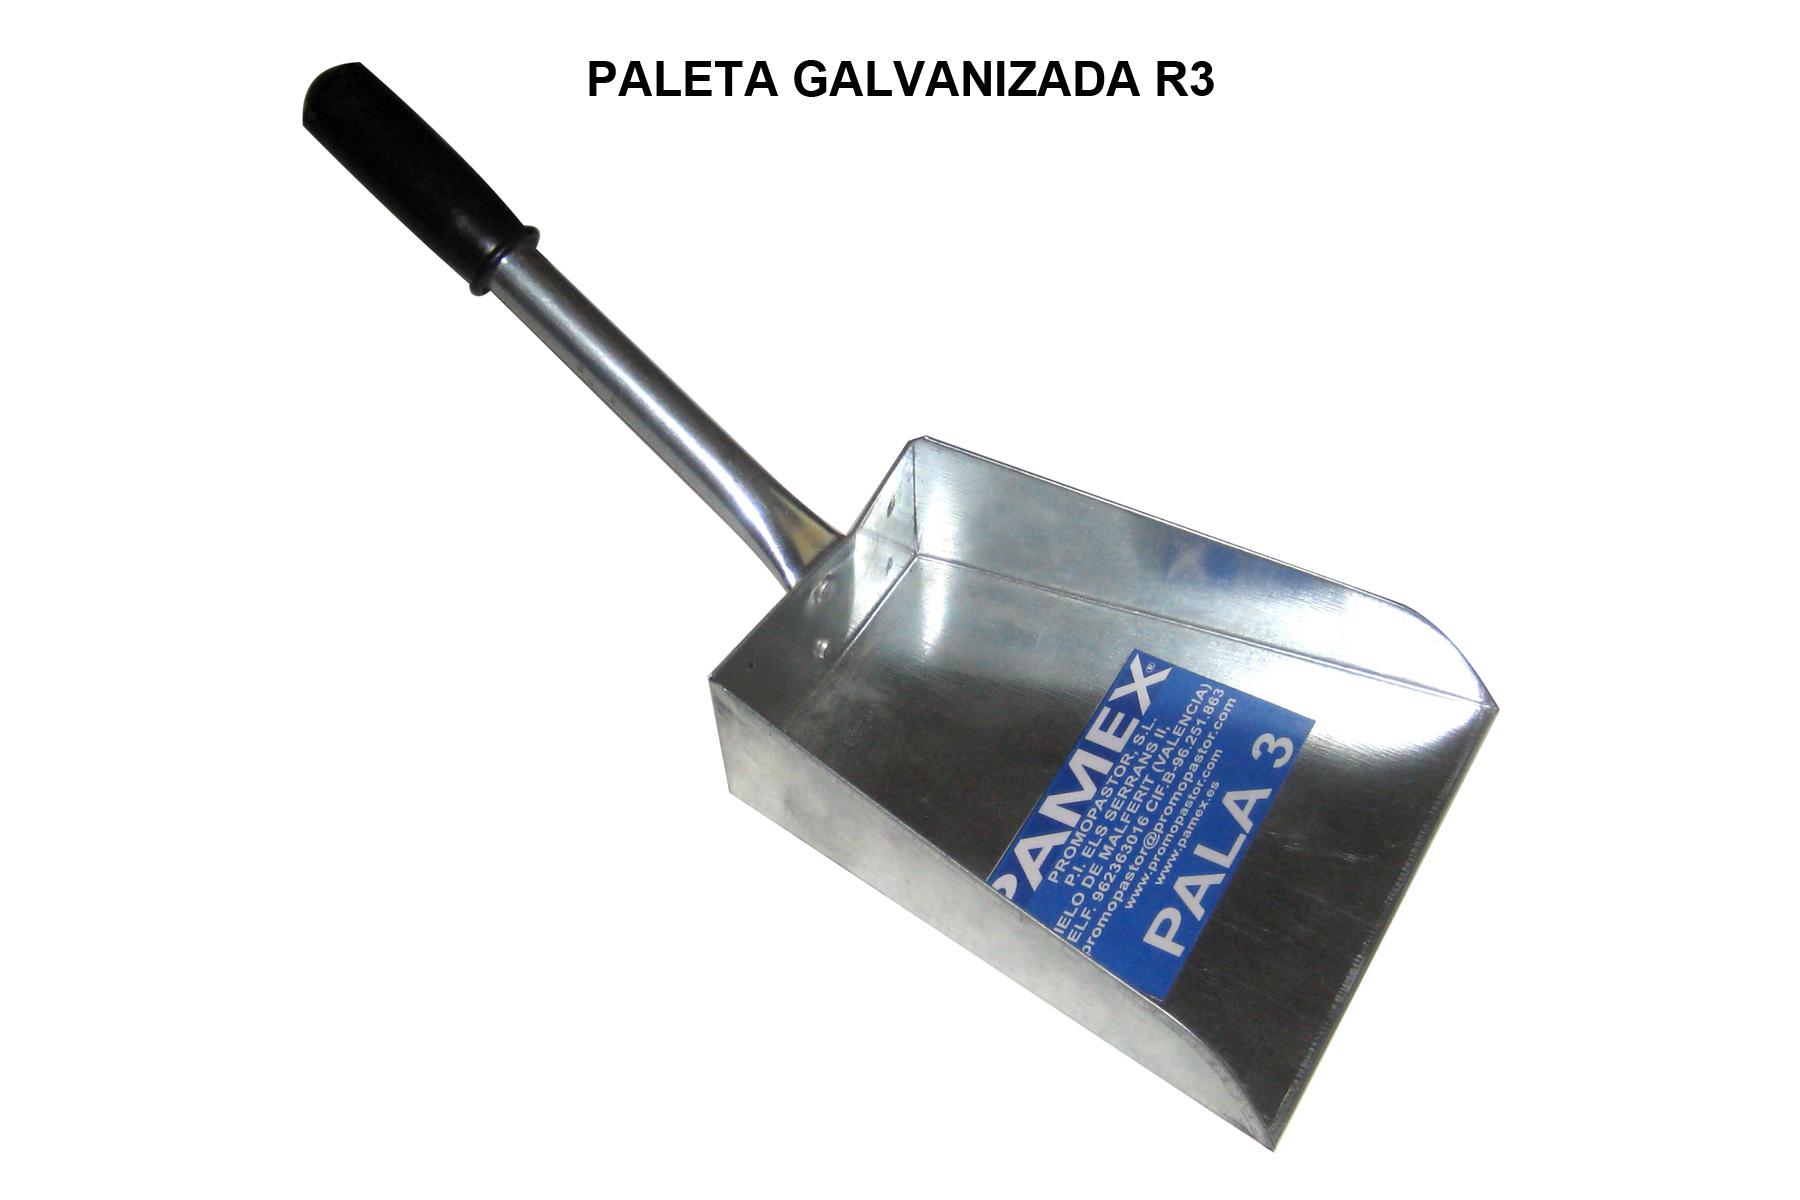 PALETA GALVANIZADA R3